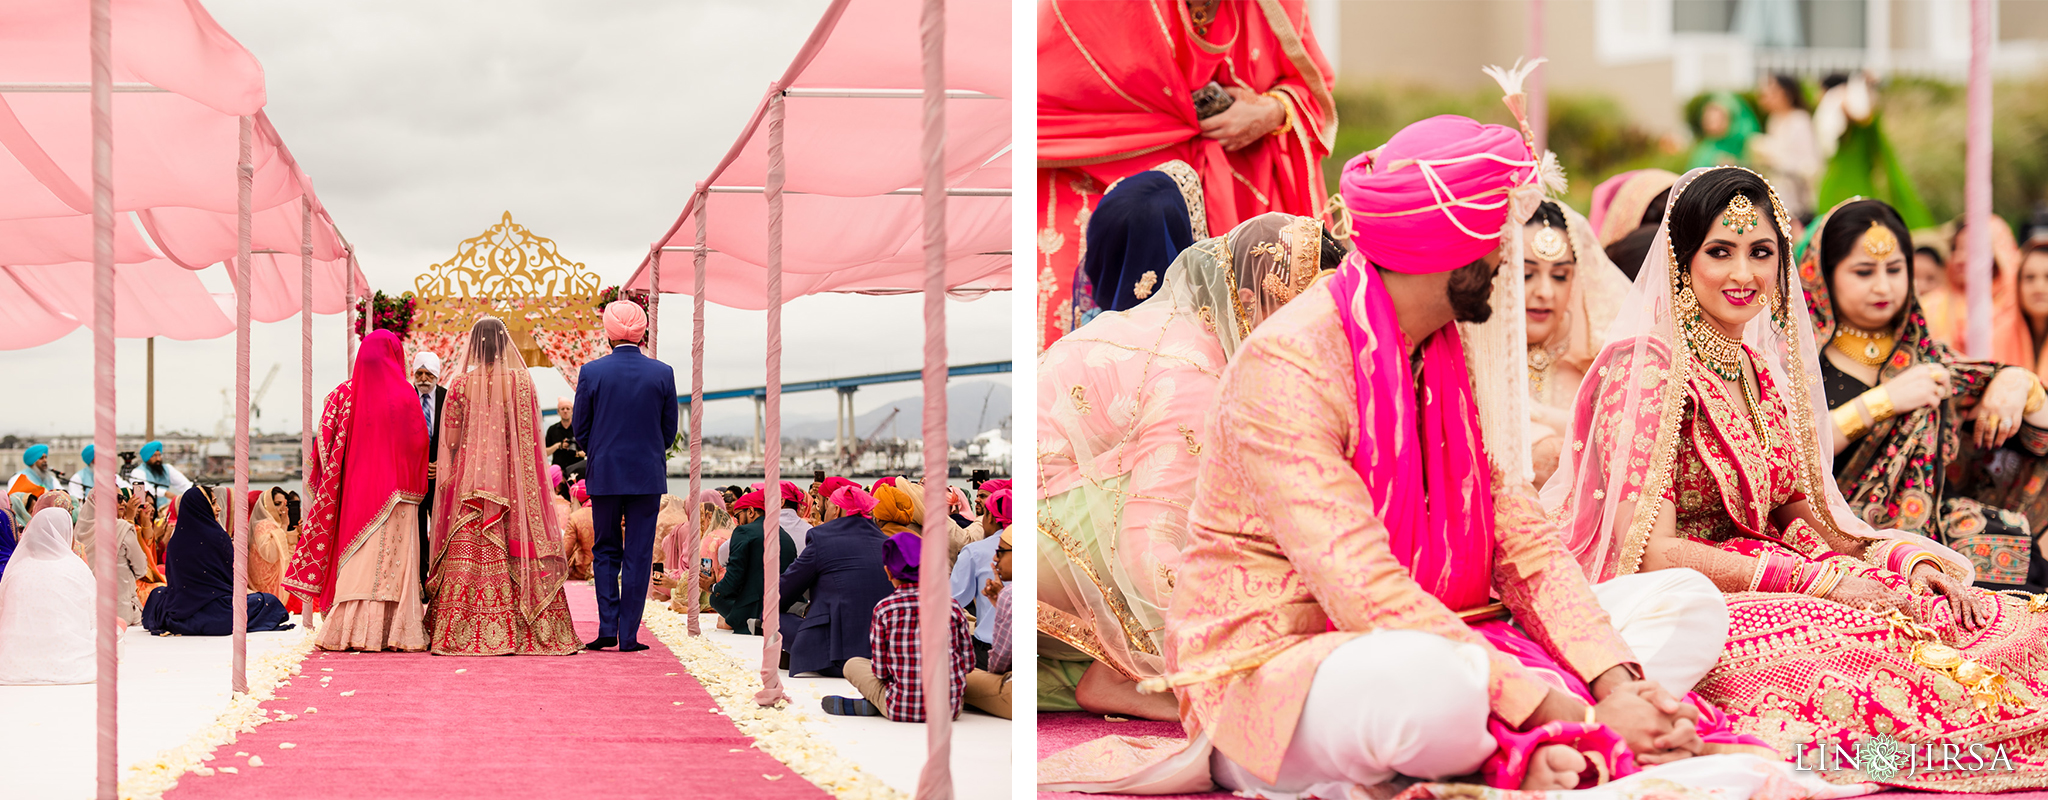 17 Coronado Resort and Spa San Diego Punjabi Wedding Photography